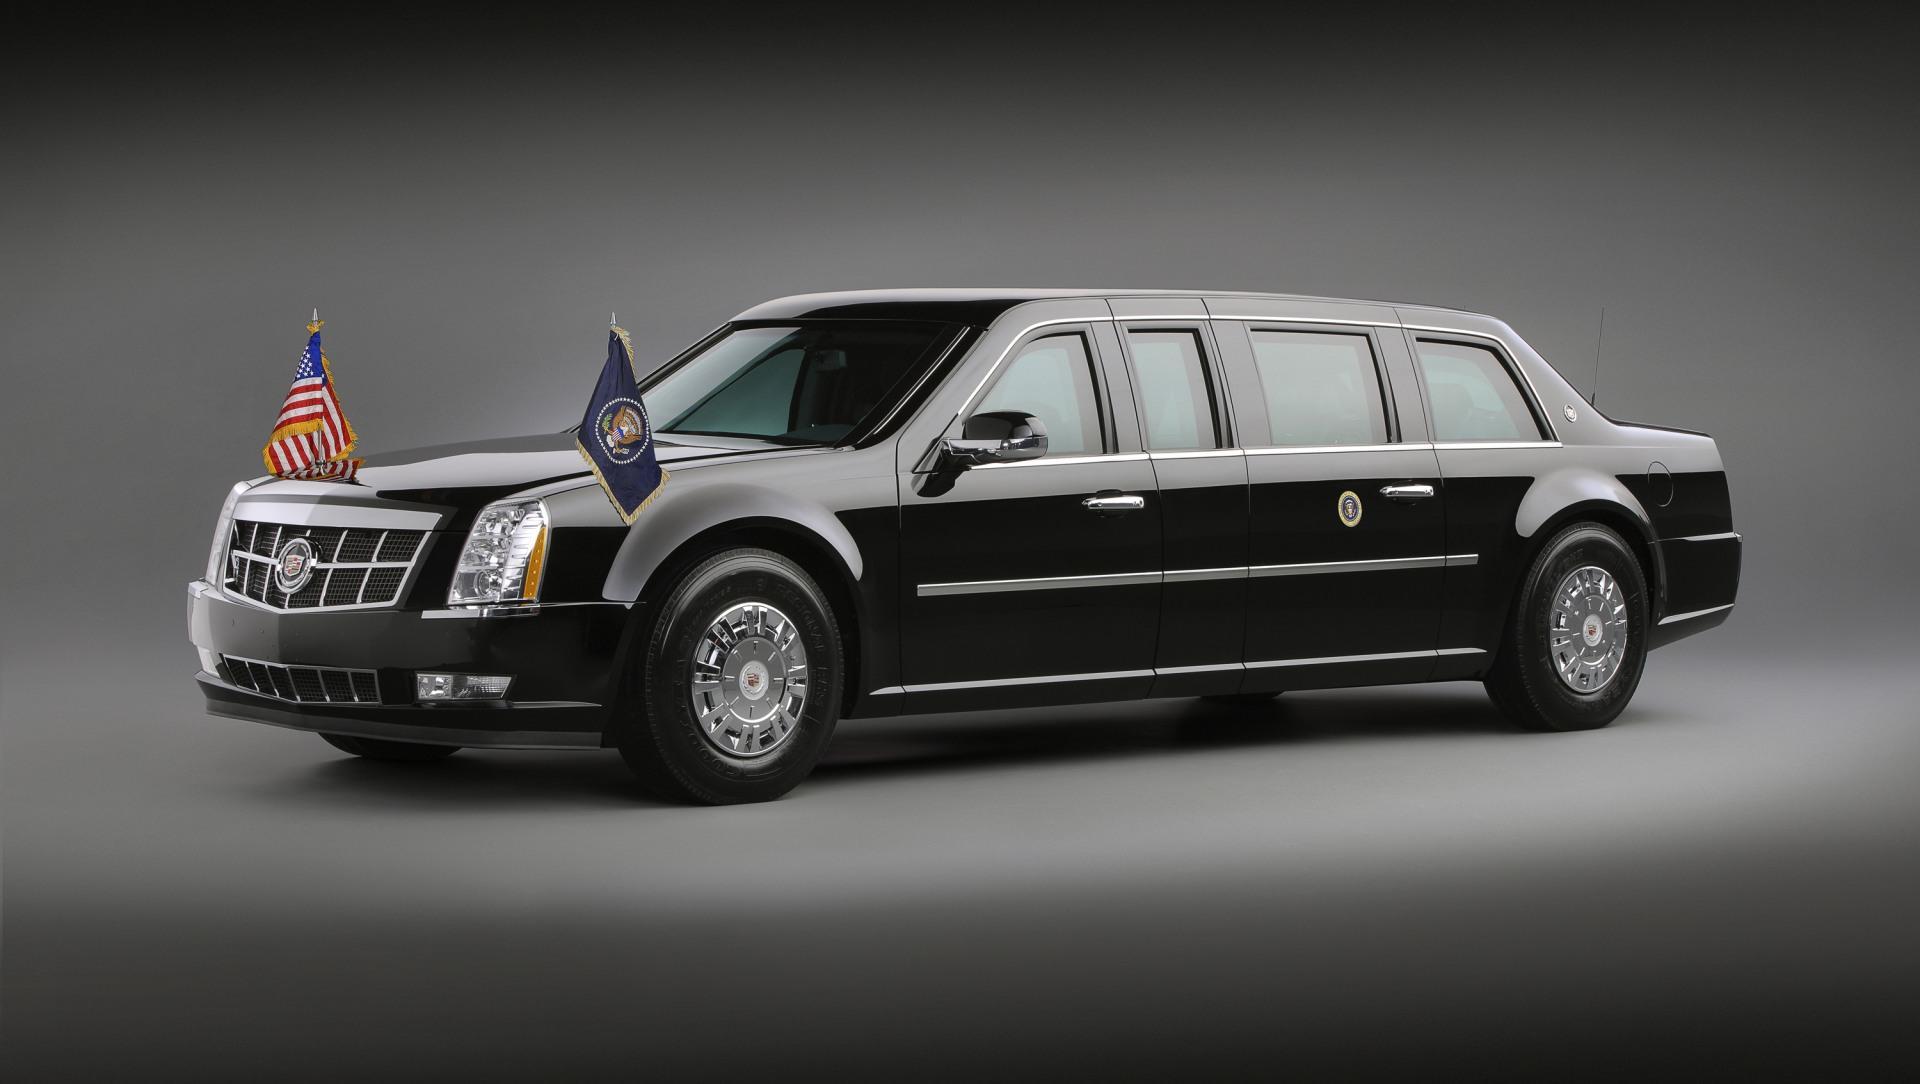 2009 cadillac presidential limousine. Black Bedroom Furniture Sets. Home Design Ideas